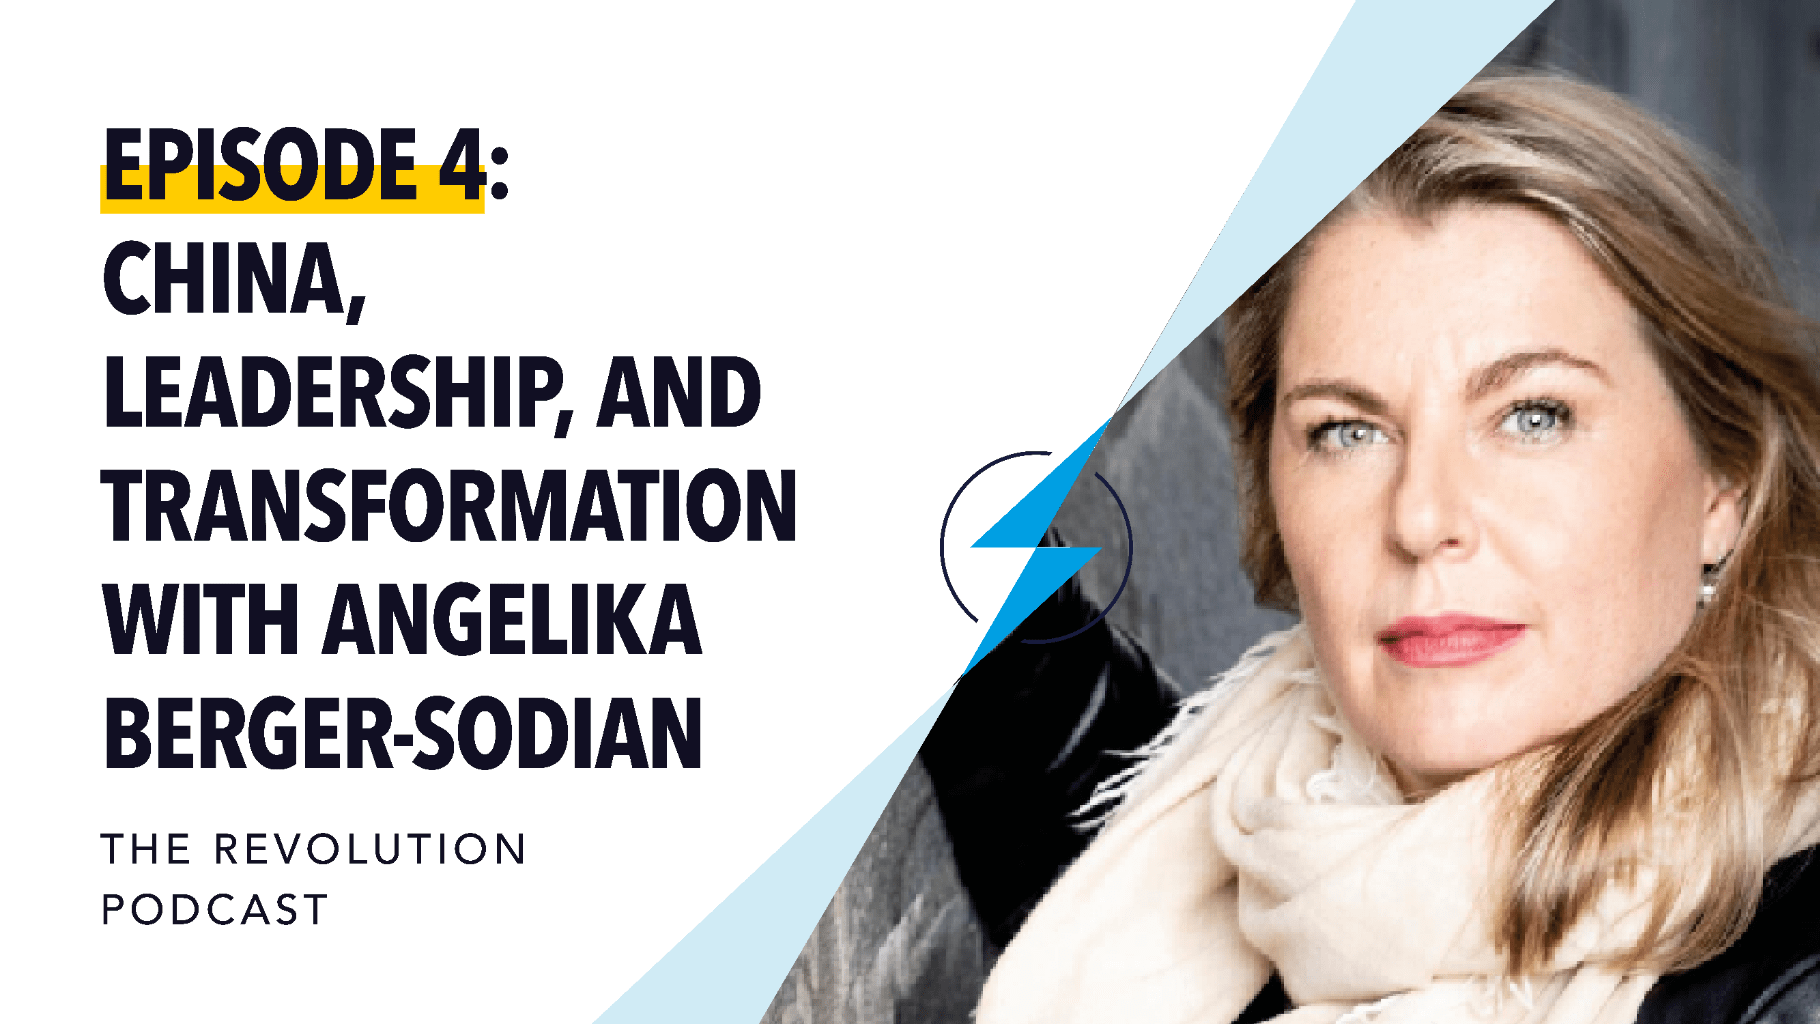 Angelika Berger-Sodian